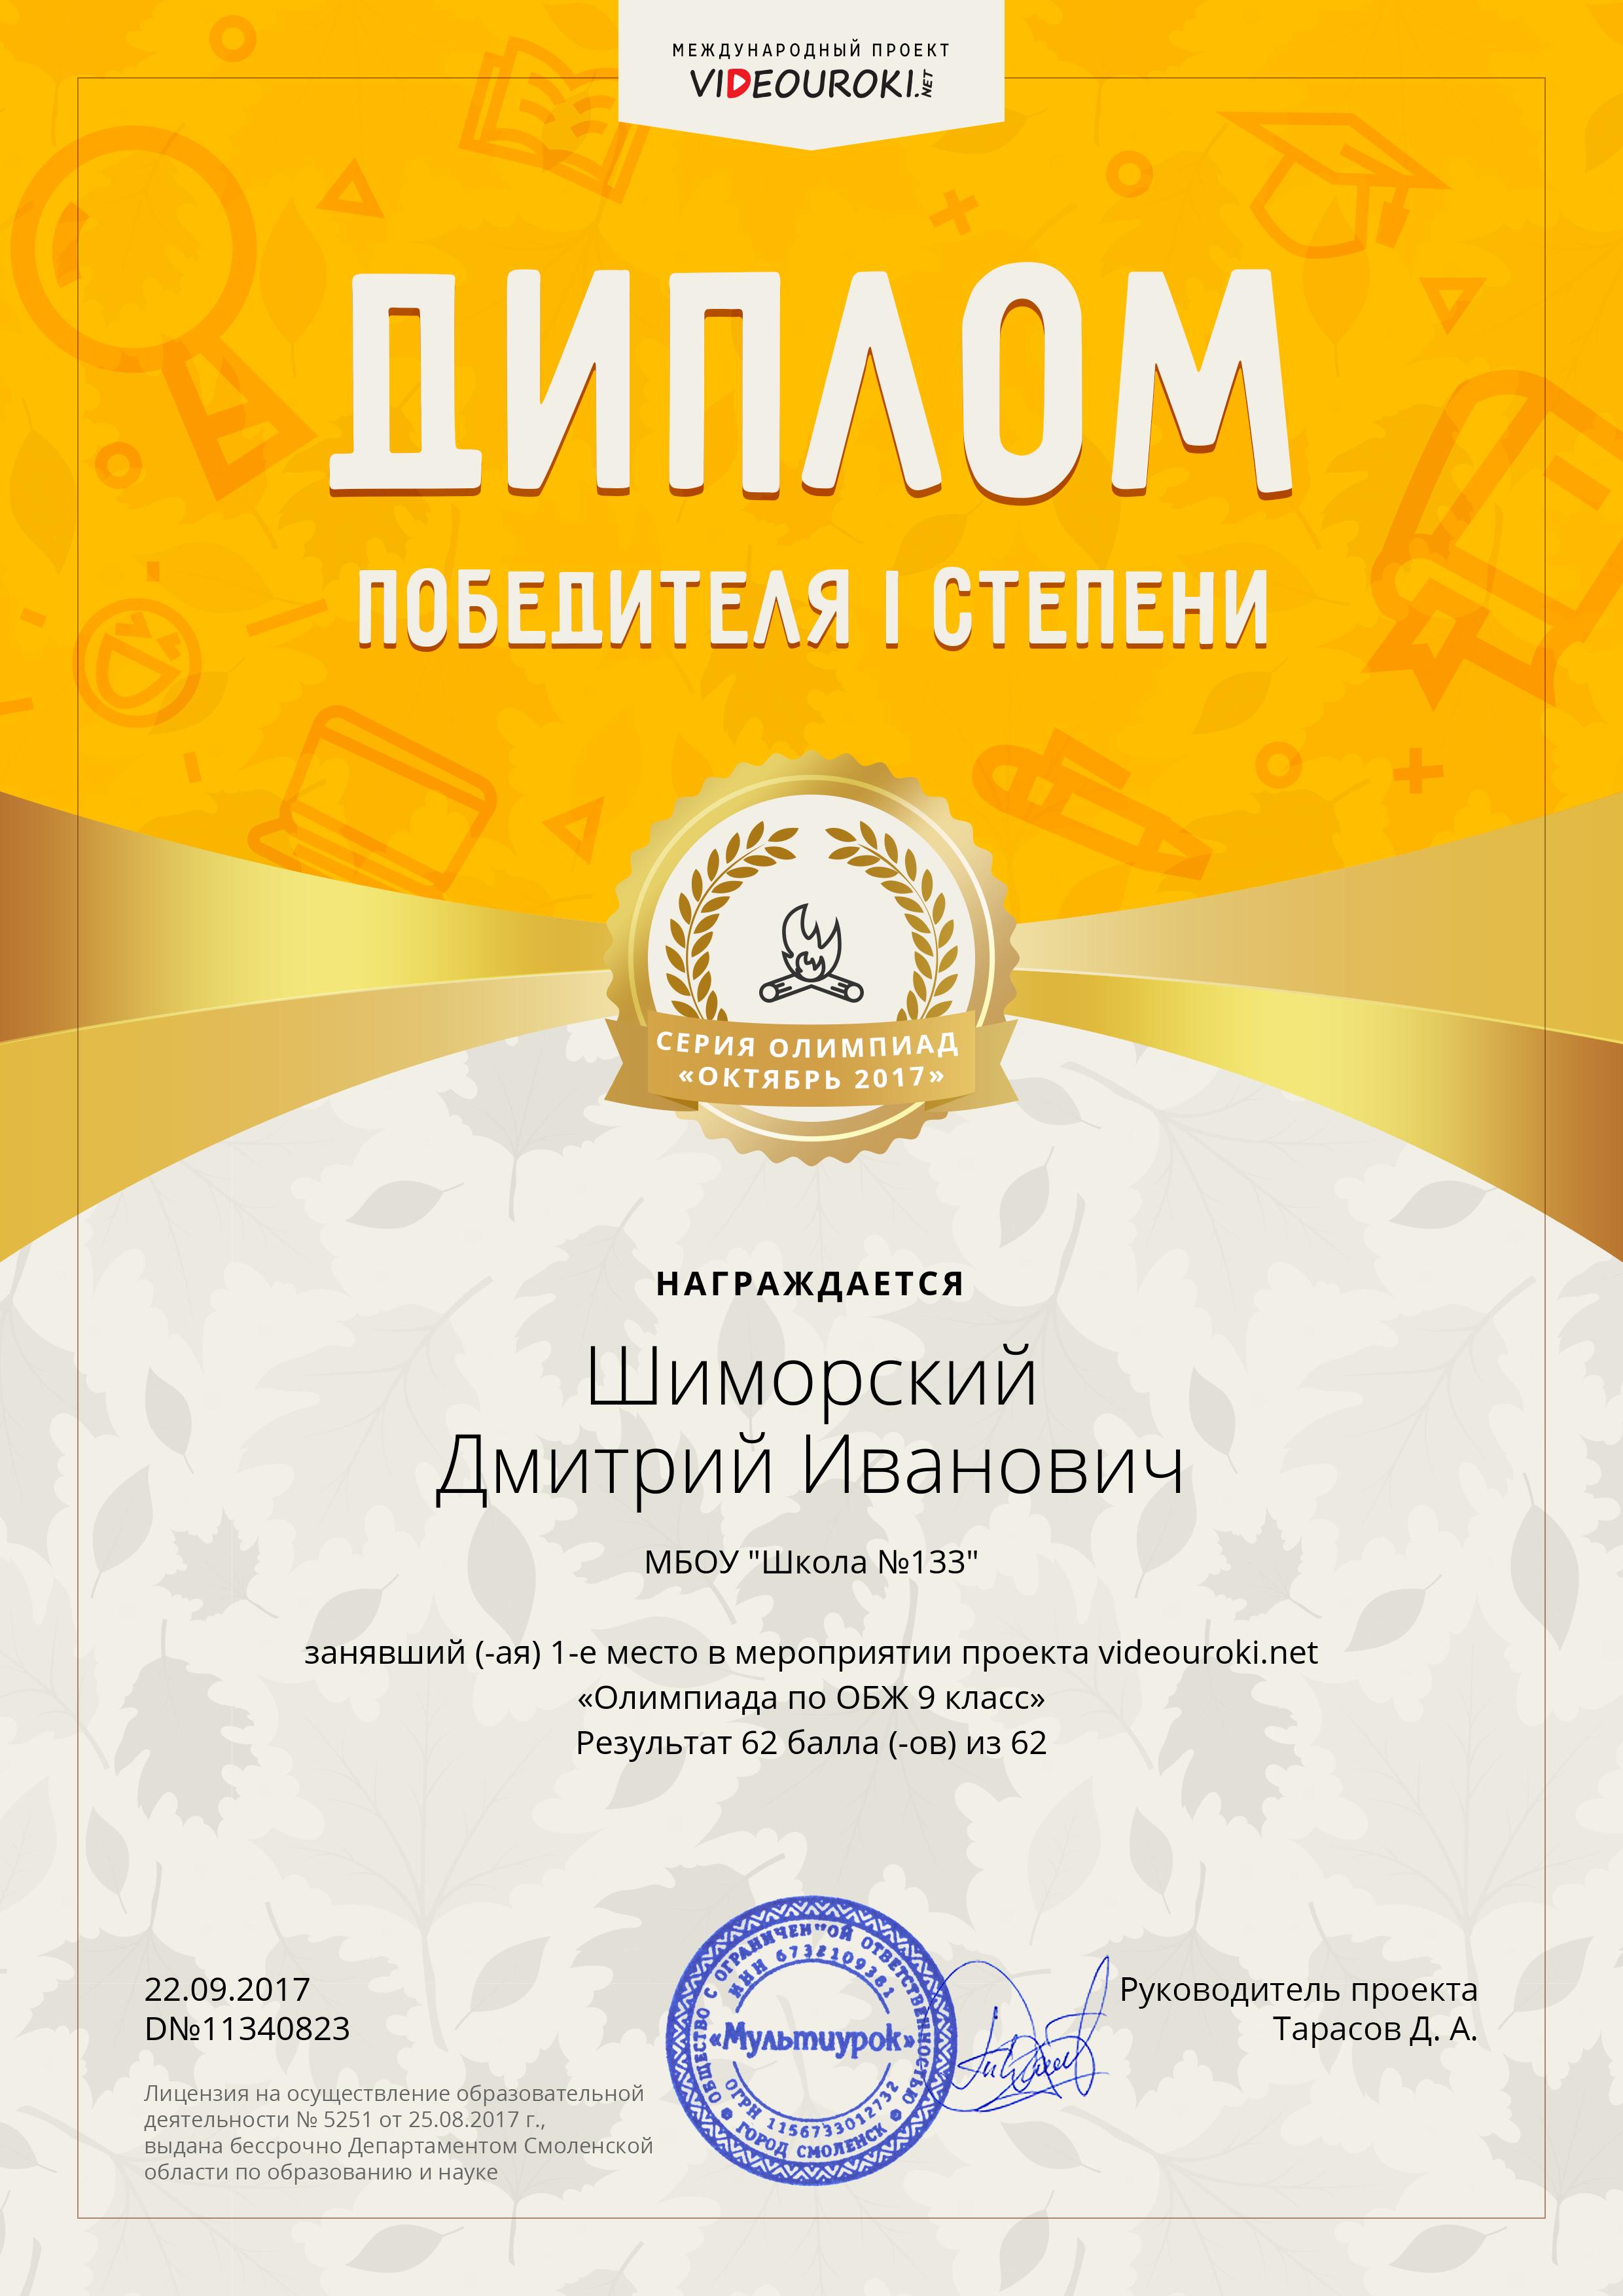 95256140. 11340823-Шиморский Дмитрий Иванович.png